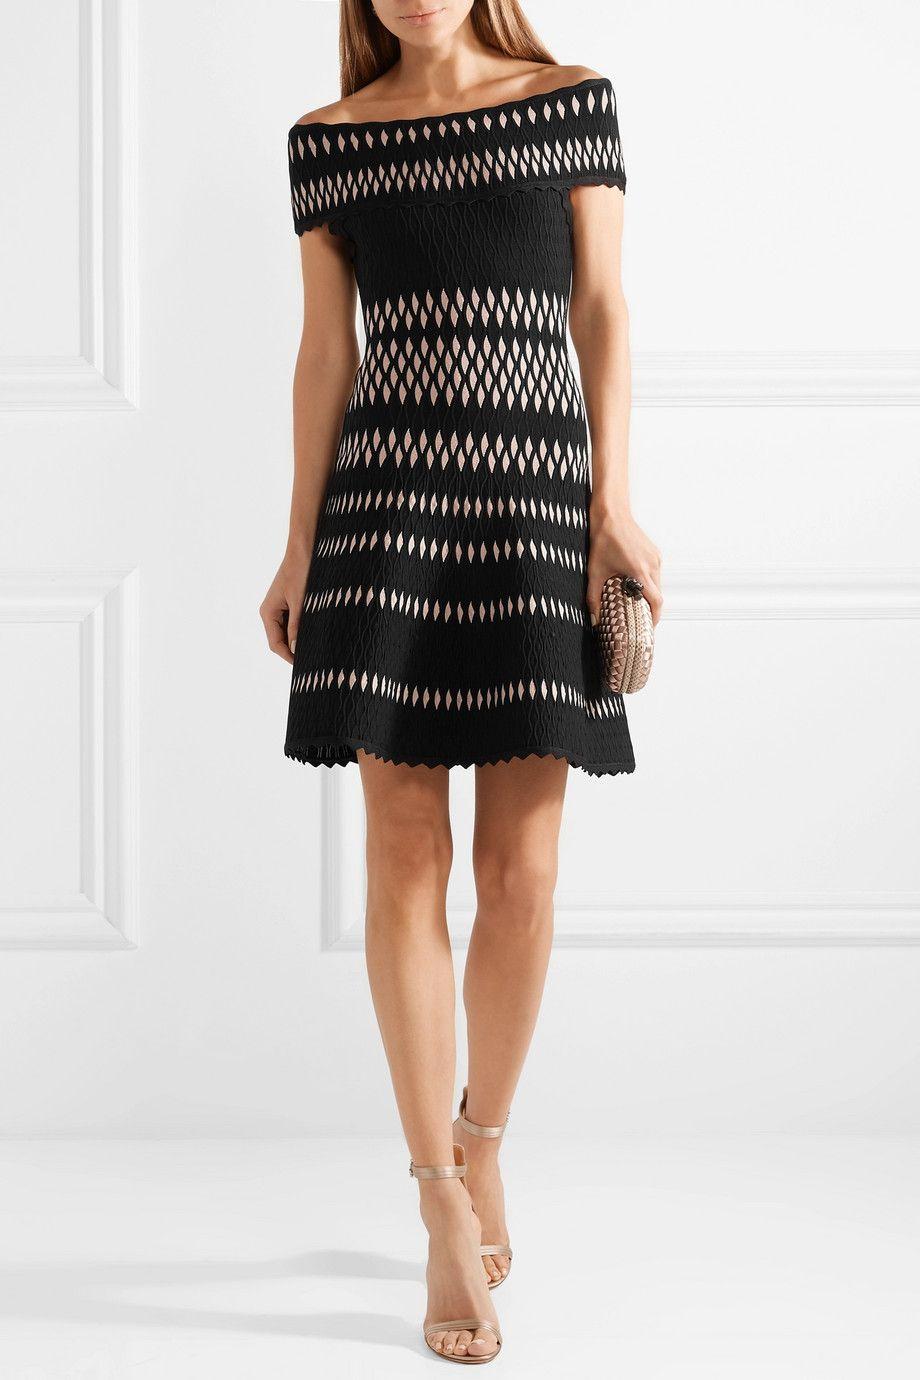 Stretch Jacquard-knit Mini Dress - Black H 1xO01dqVYo